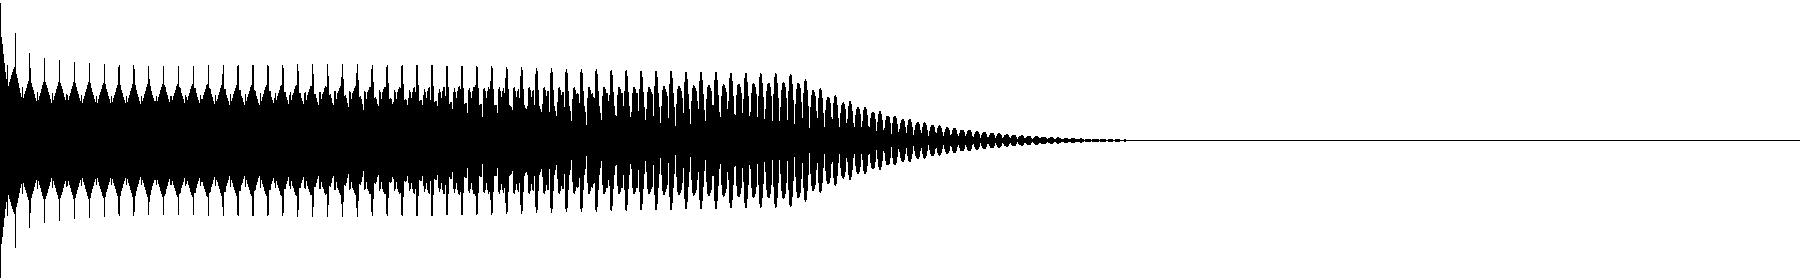 bass stab 5